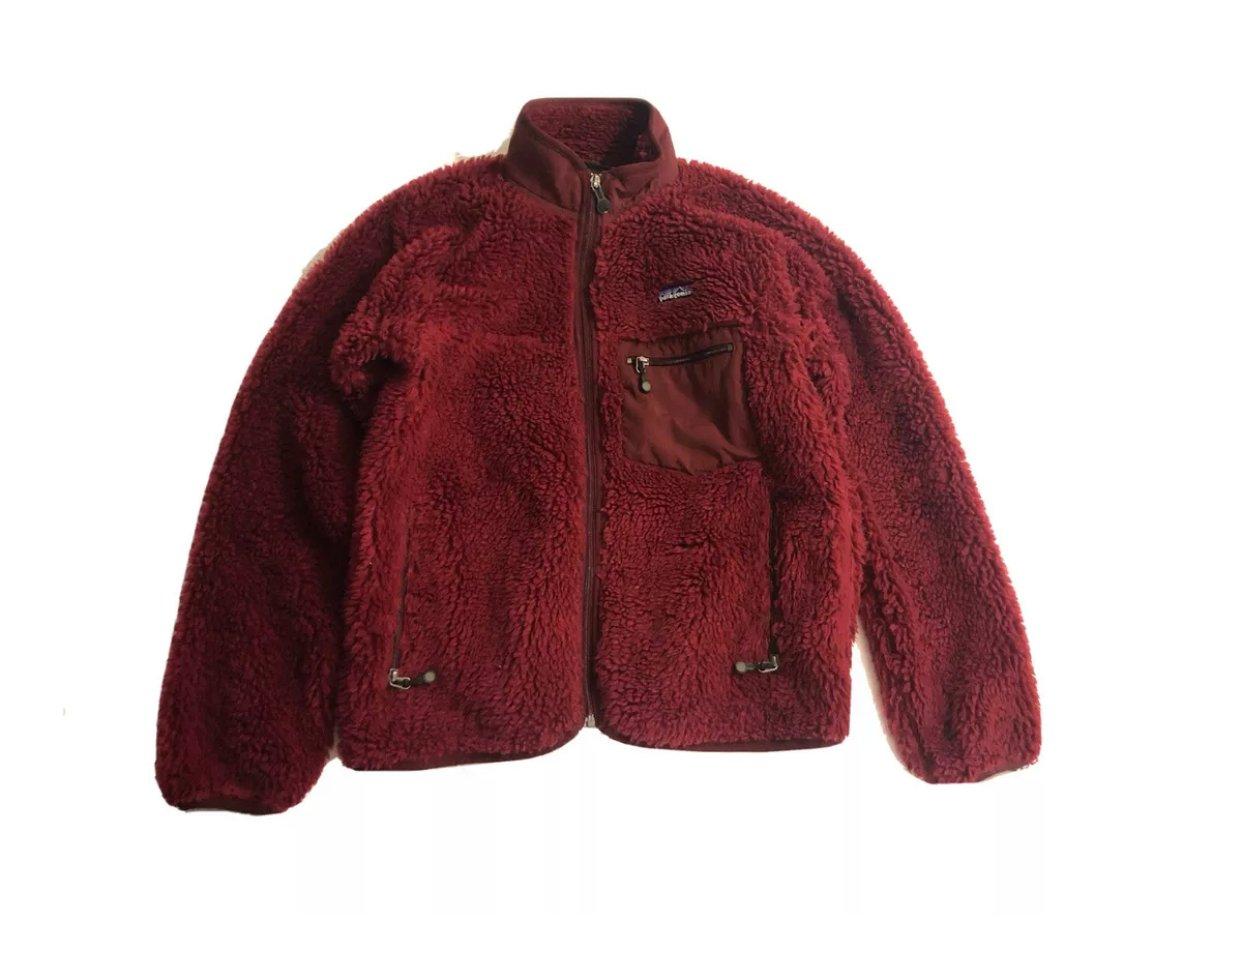 Image of Vintage Patagonia Retro-X Deep Pile Jacket Small